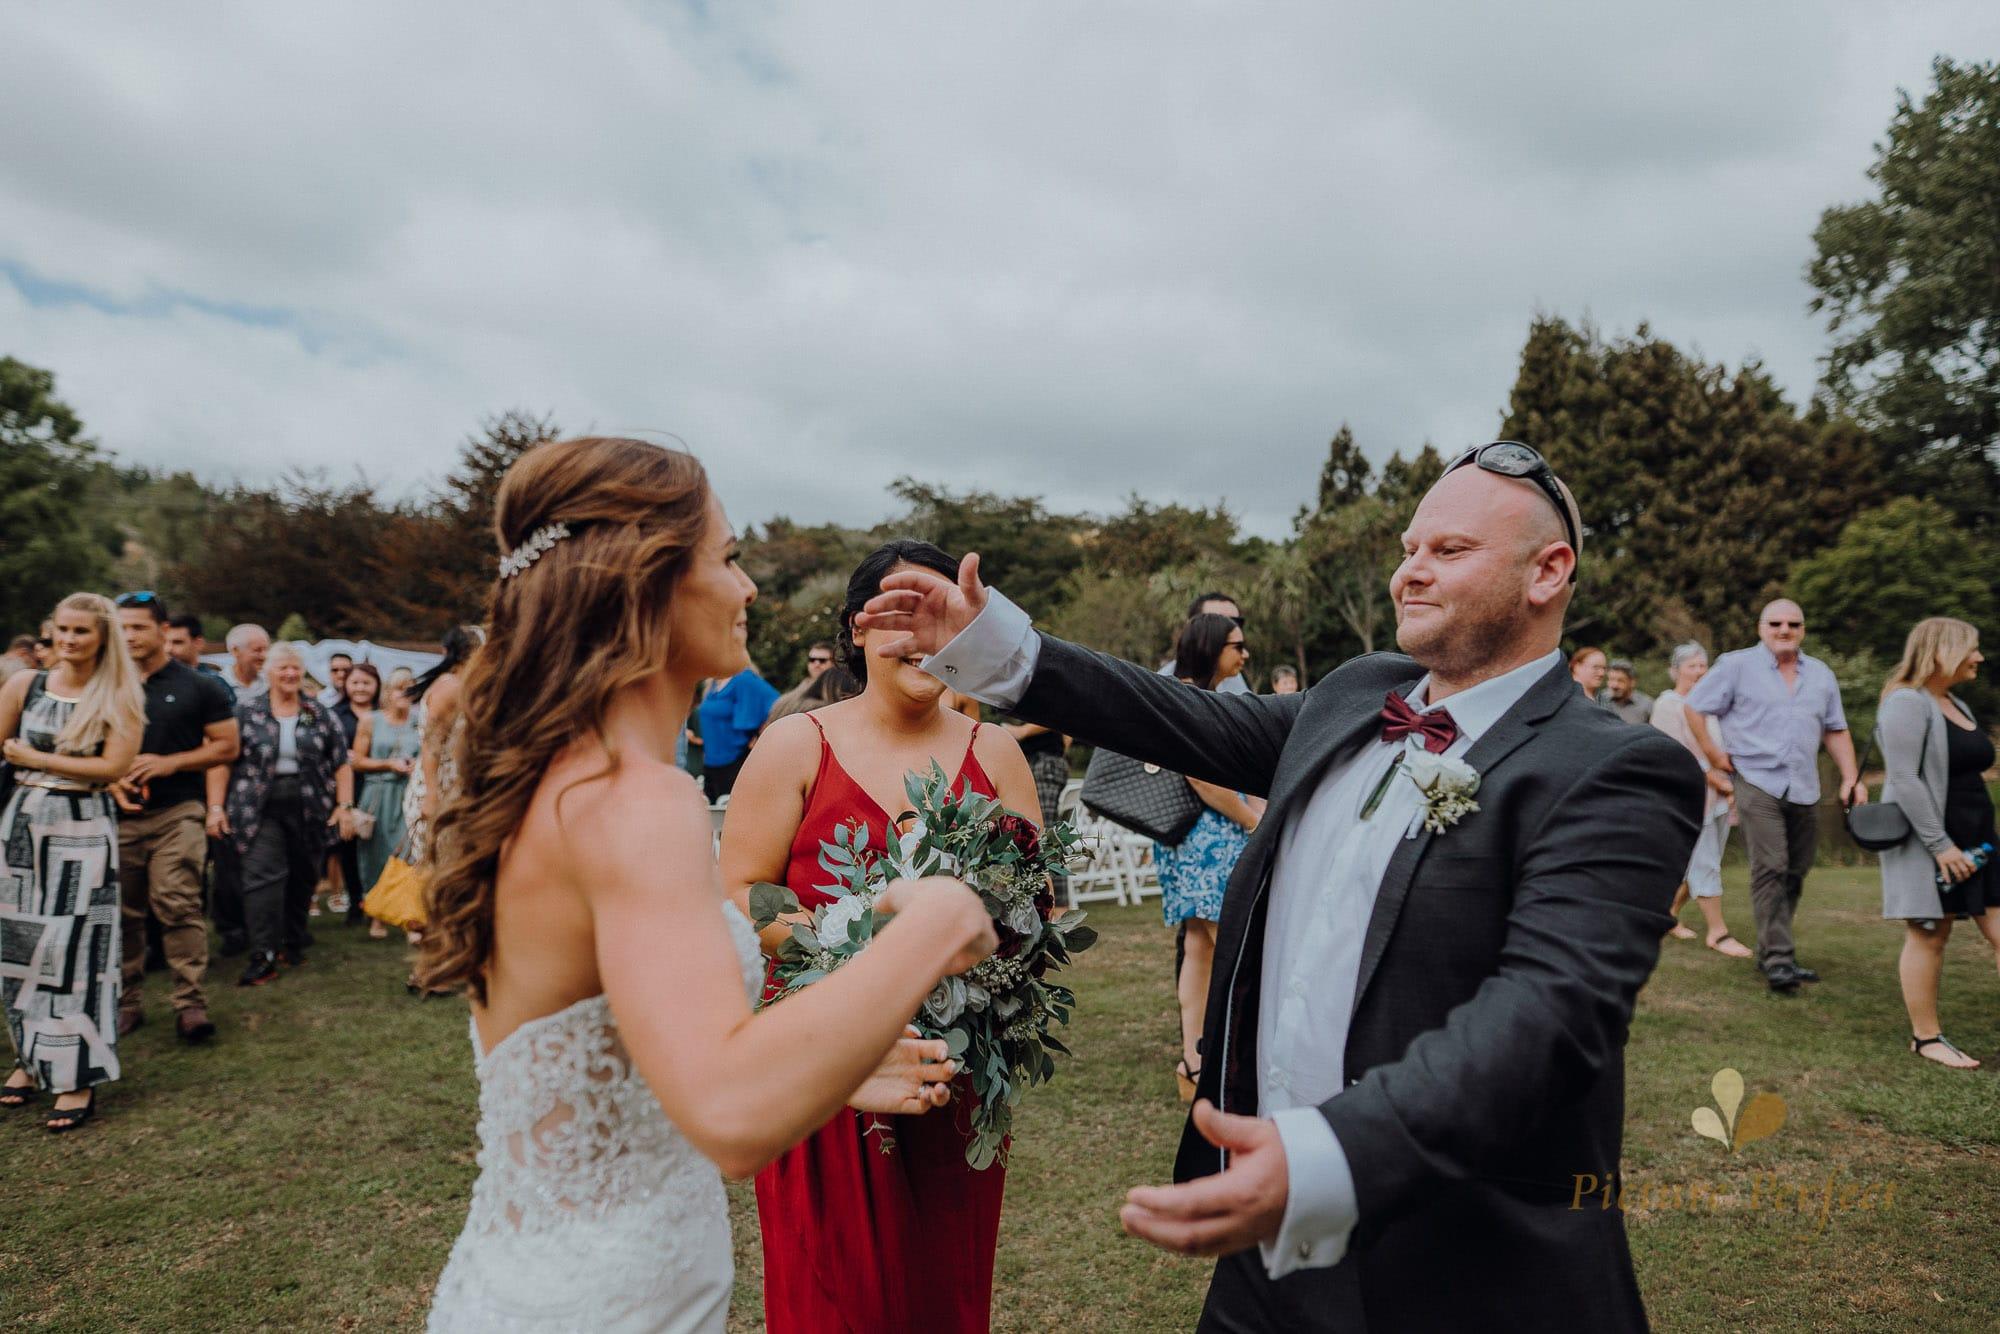 Roseburb Park wedding of Casey 1546